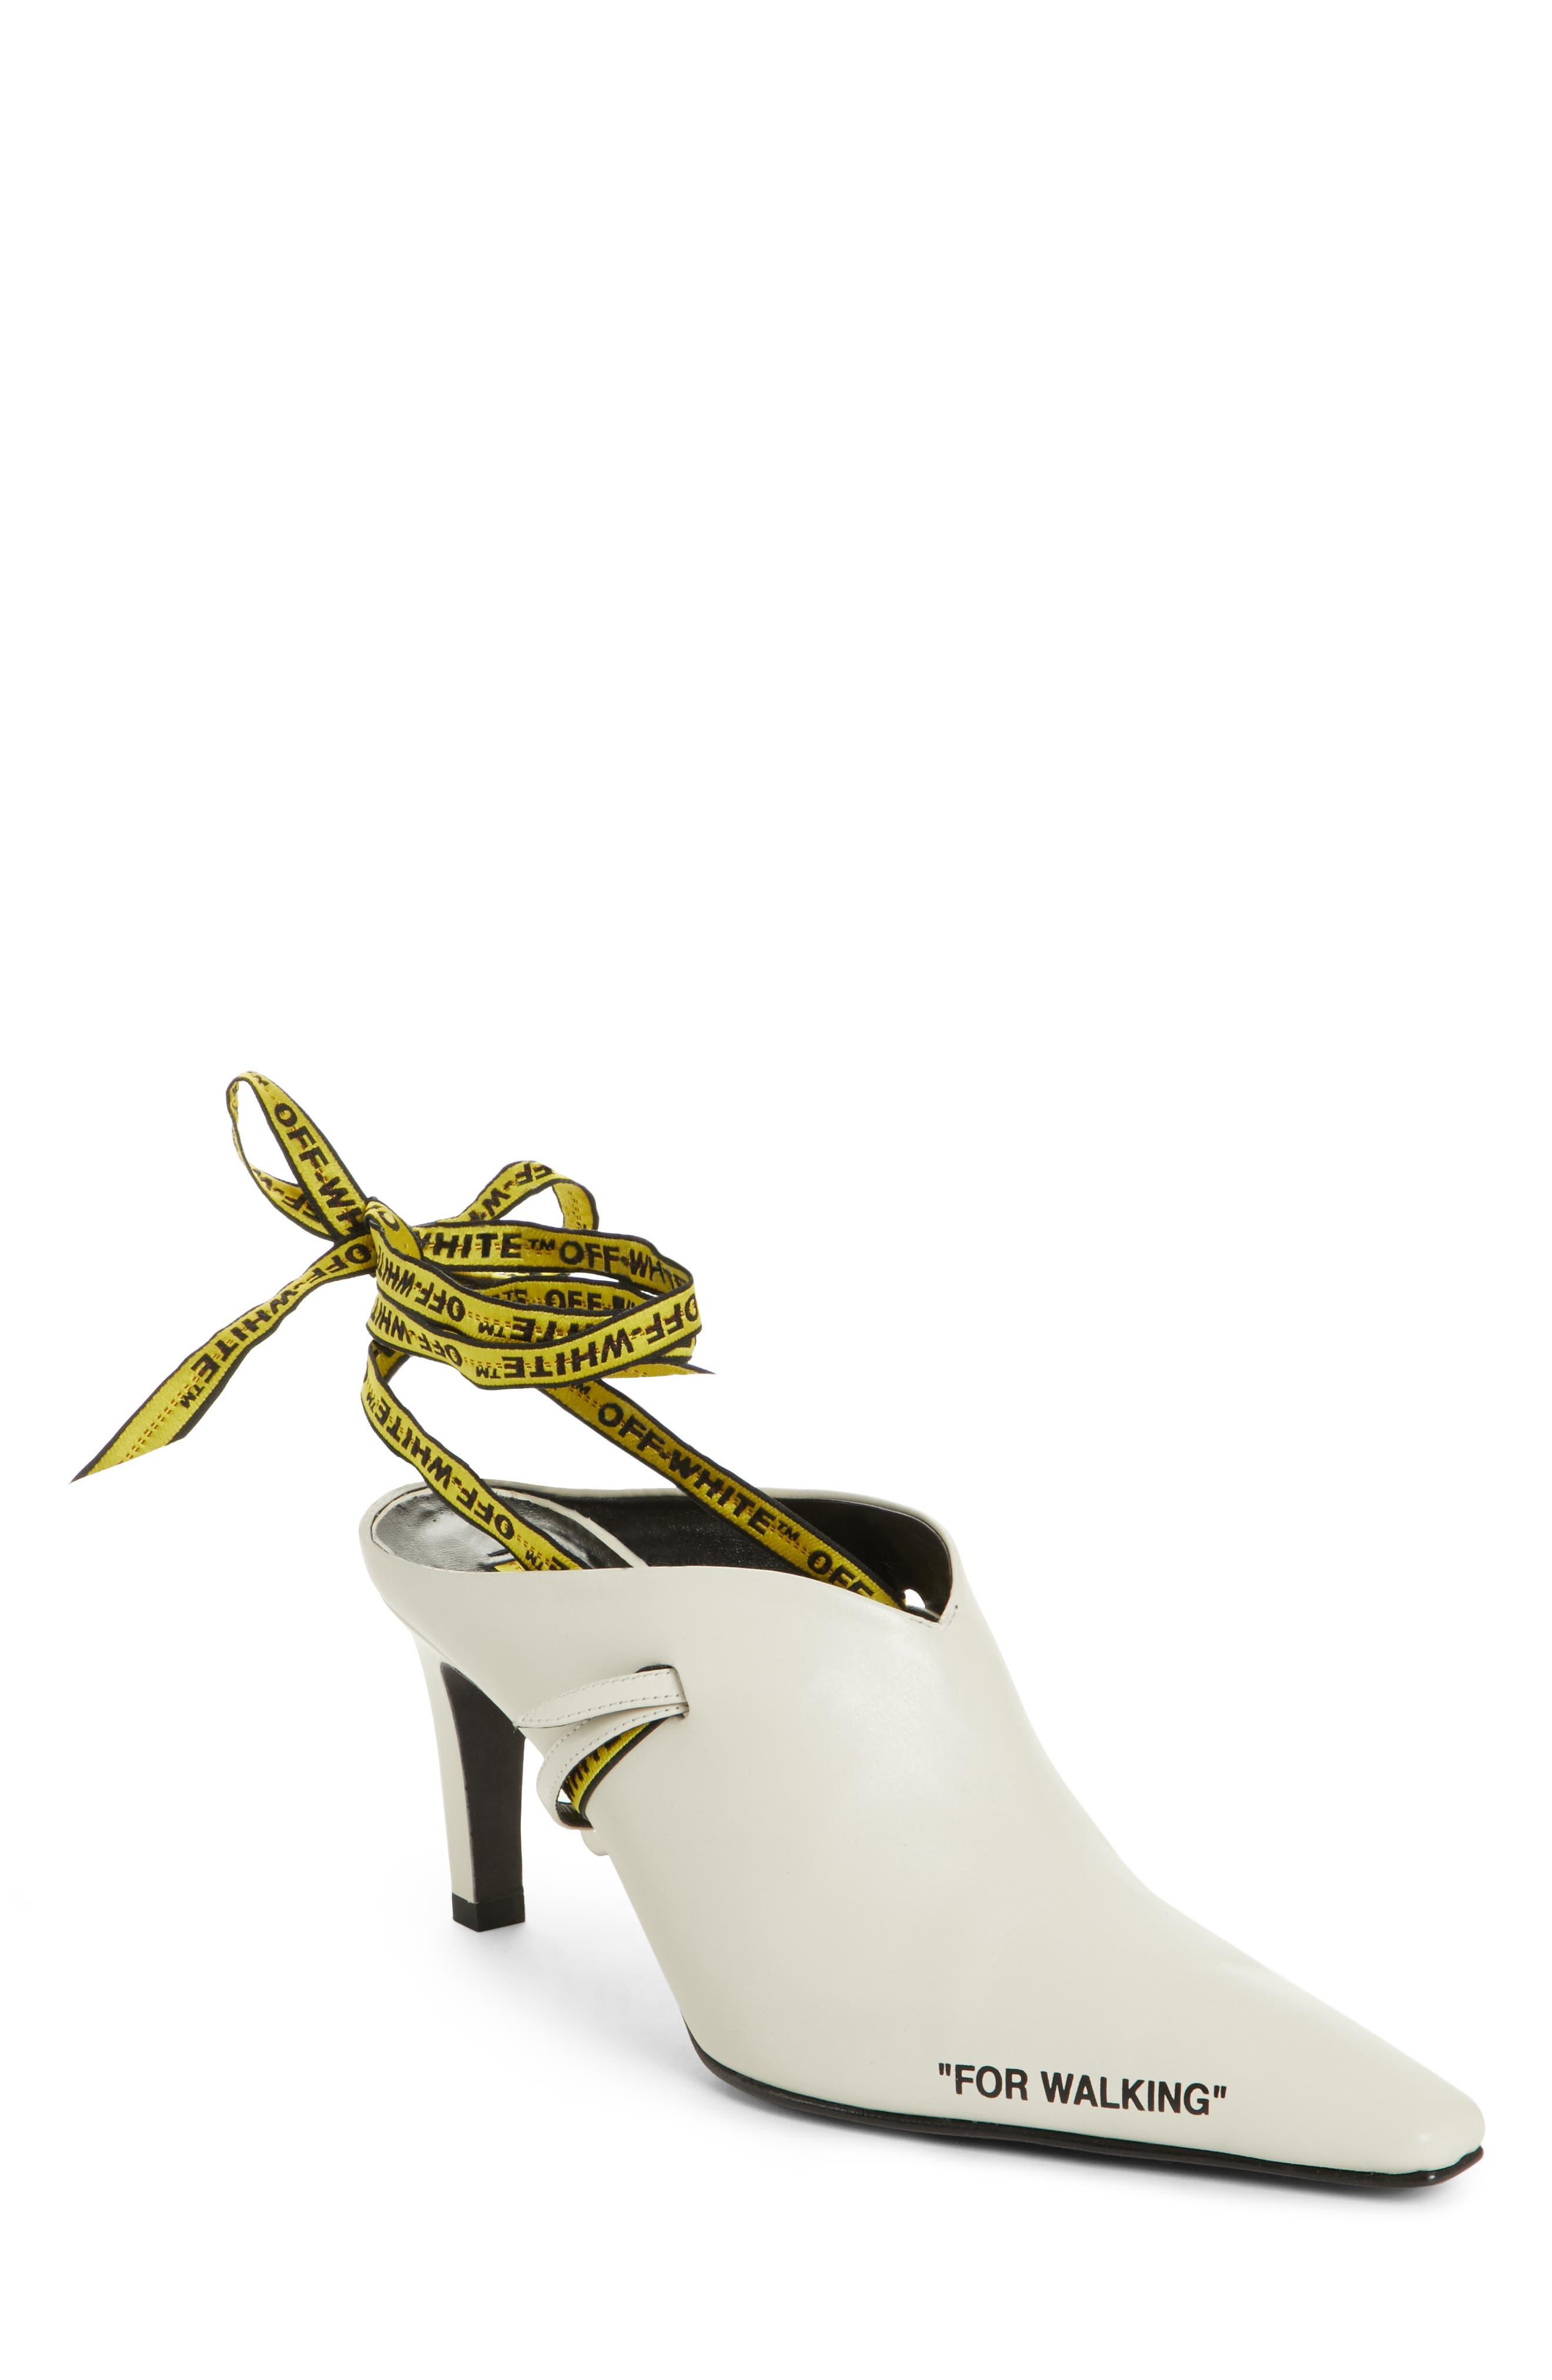 Alternate Image 1 Selected - Off-White For Walking Mule Pump (Women)